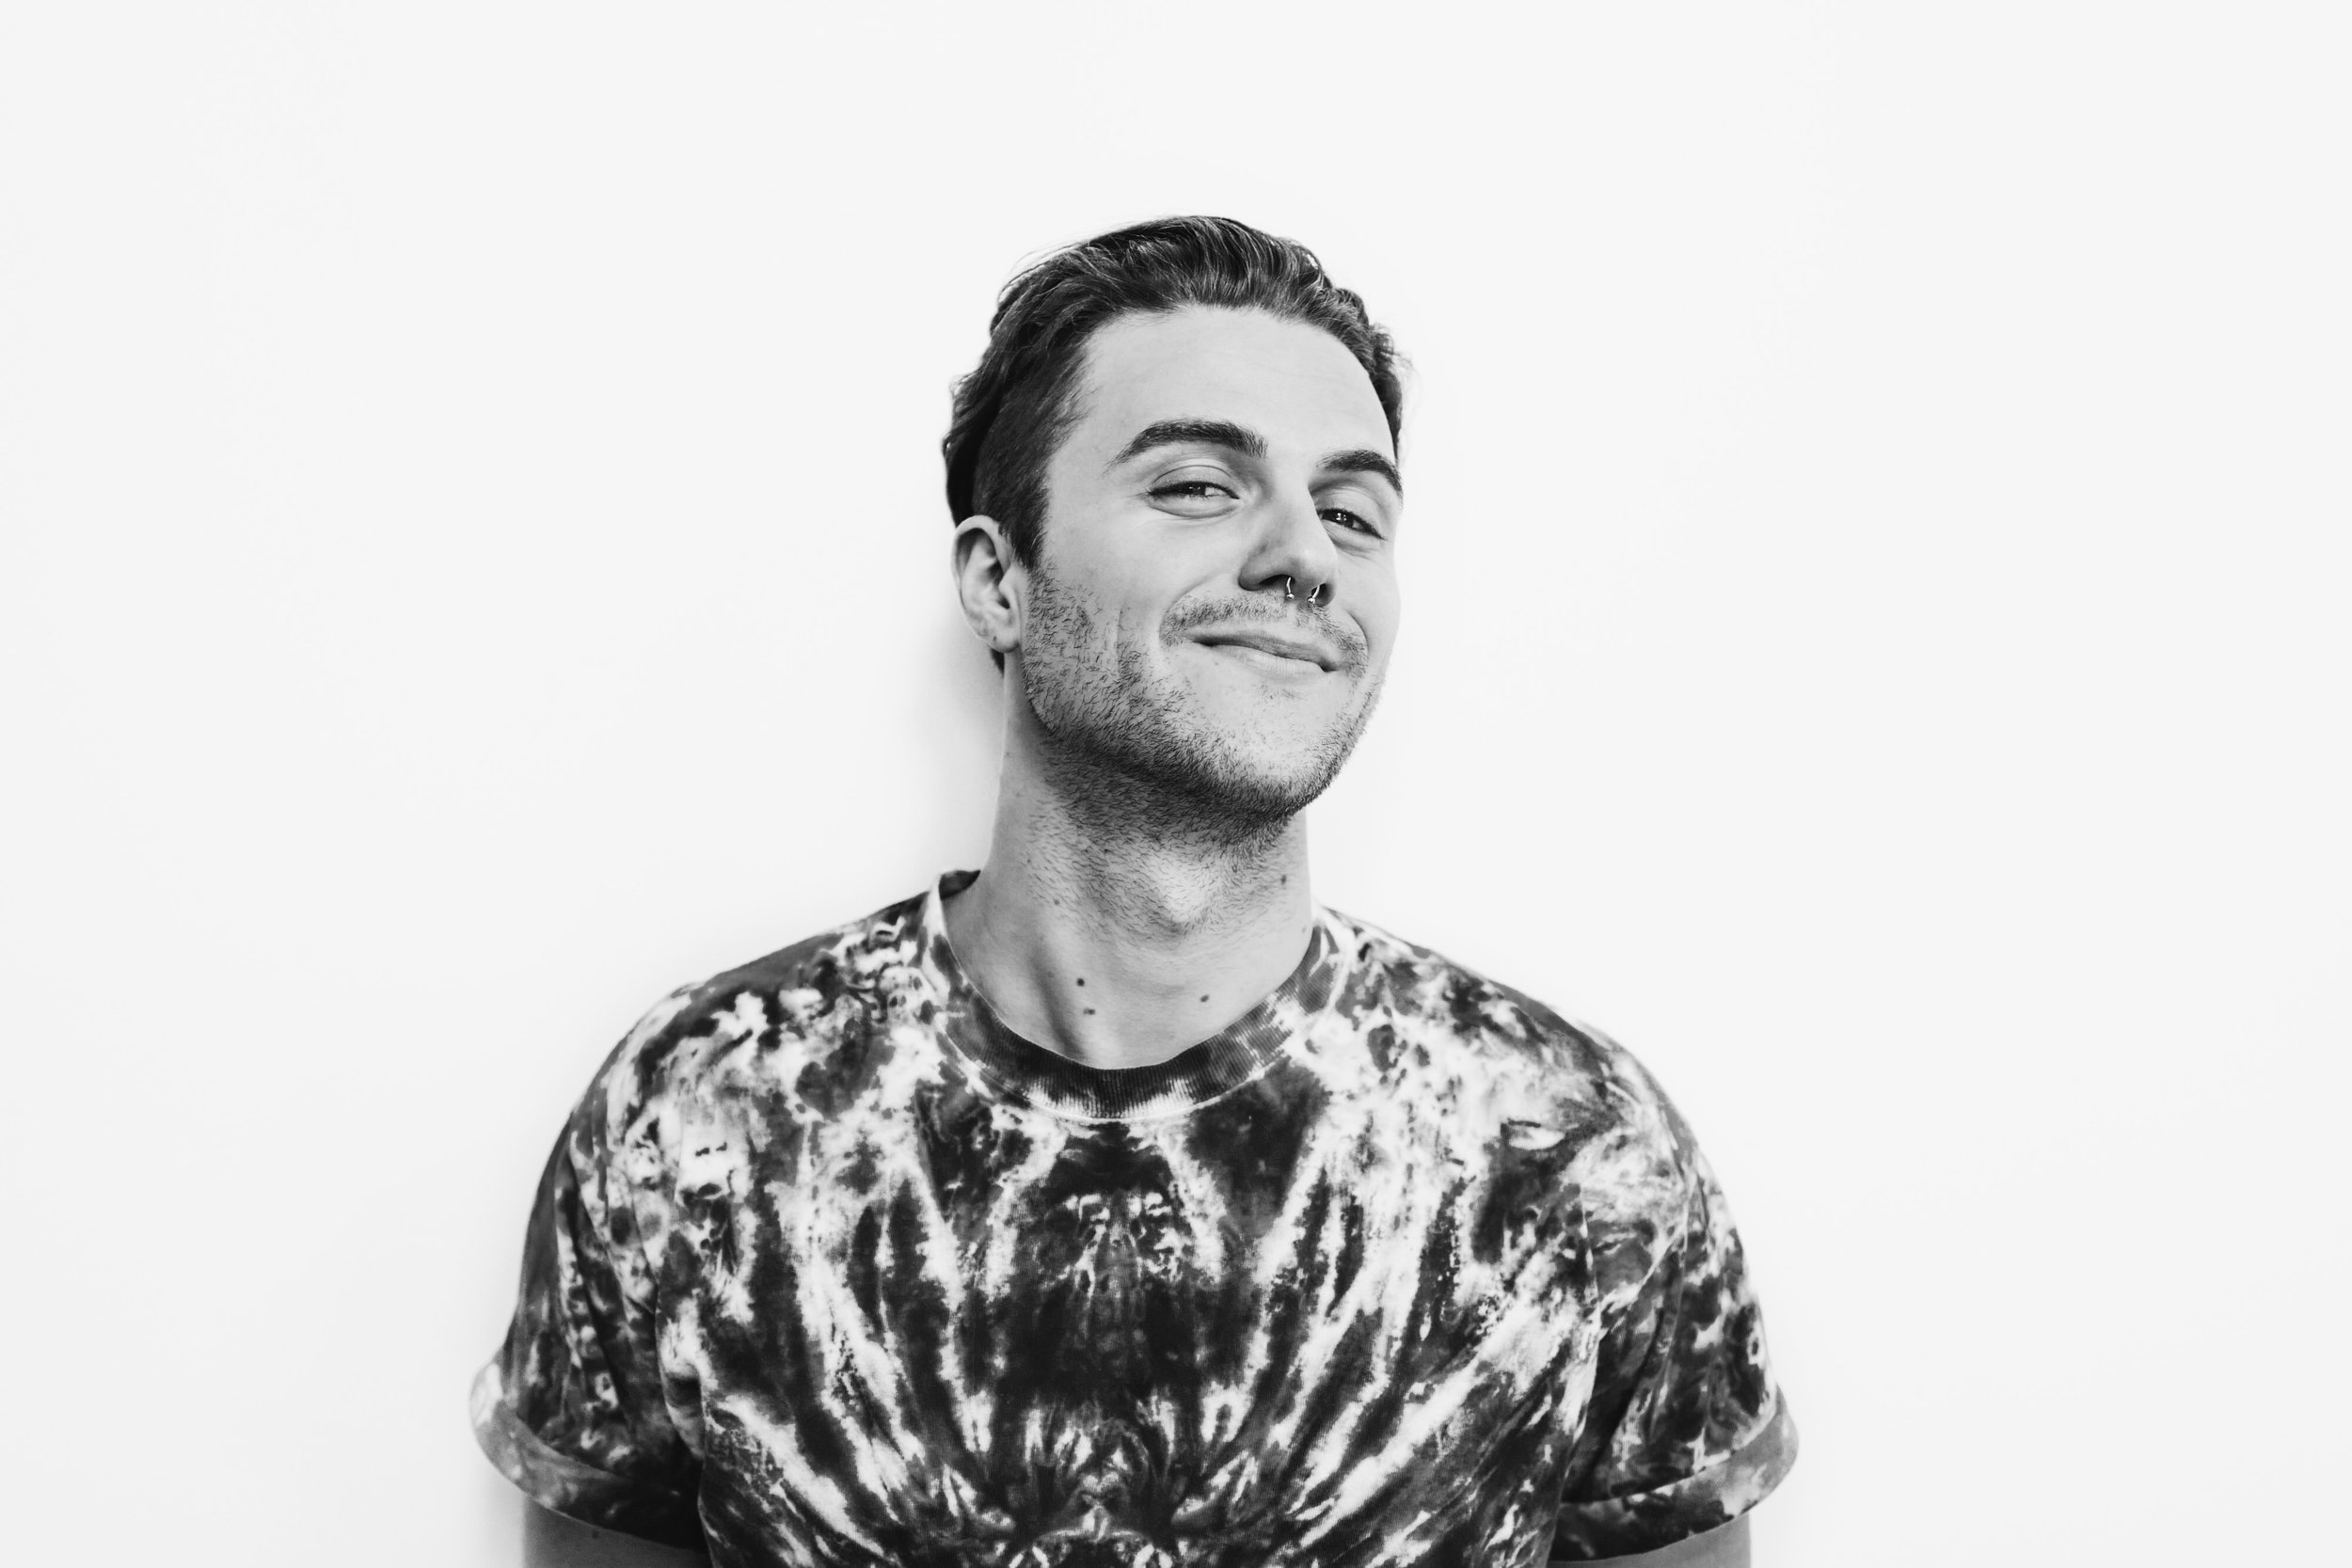 Aaron Owens-Crain, Marketing Coordinator - Invented the hipster bro